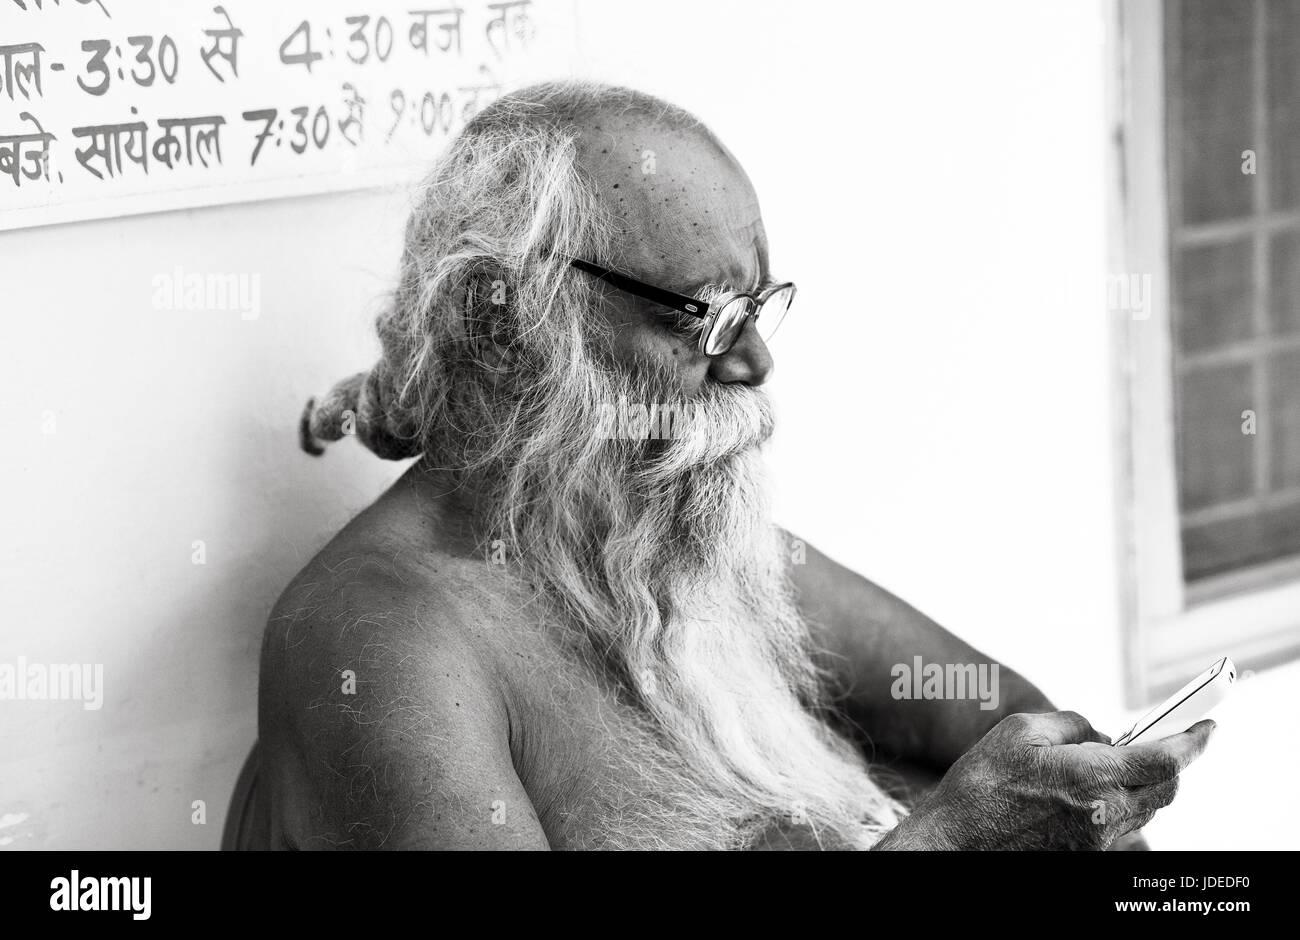 Hindu sadhu checking his phone - Stock Image